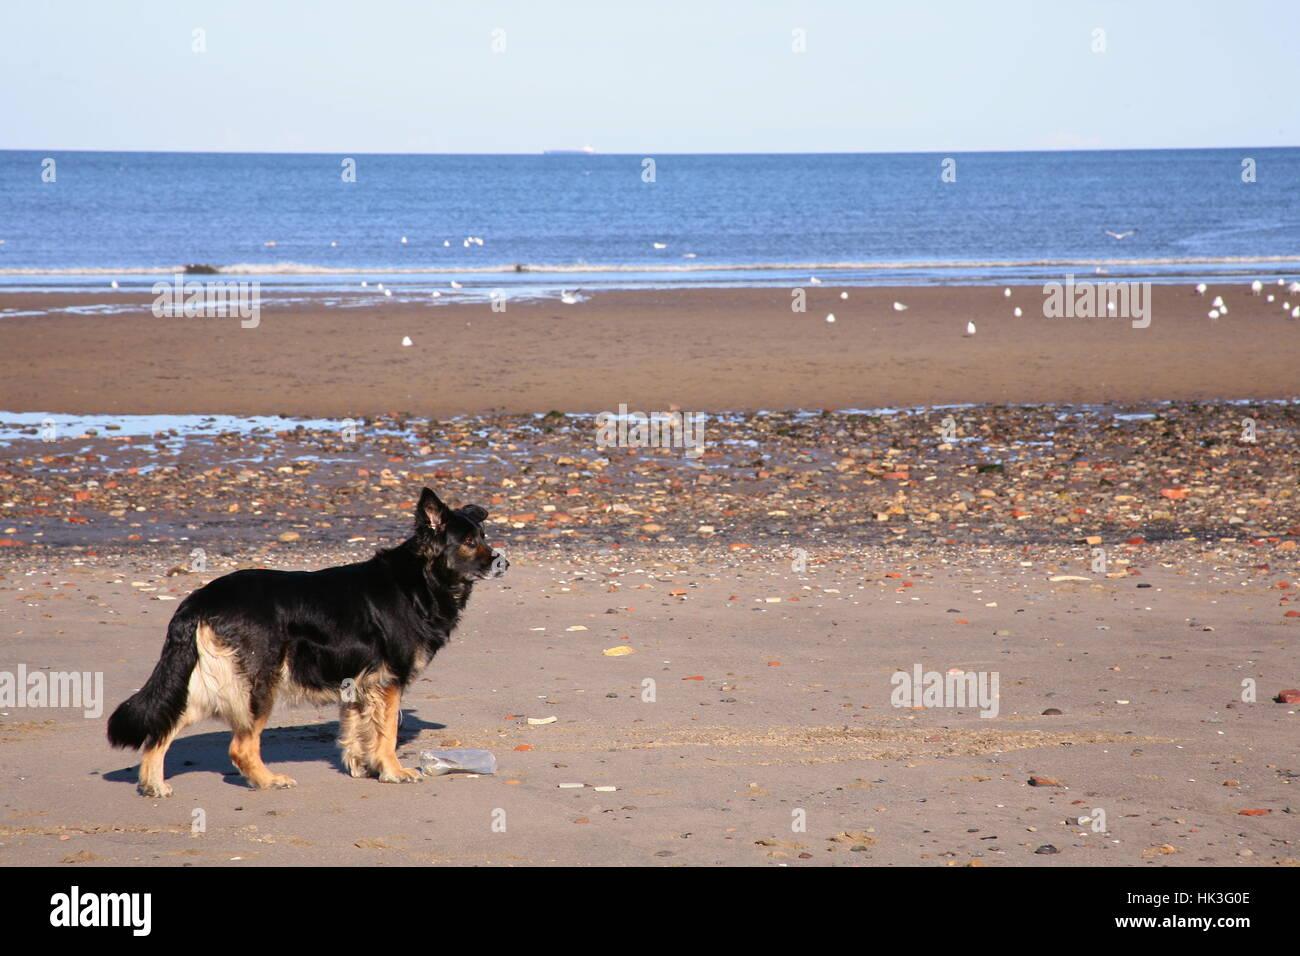 Dog on the beach in beautiful sunny weather in Edinburgh on Portobello Beach, Scotland - Stock Image